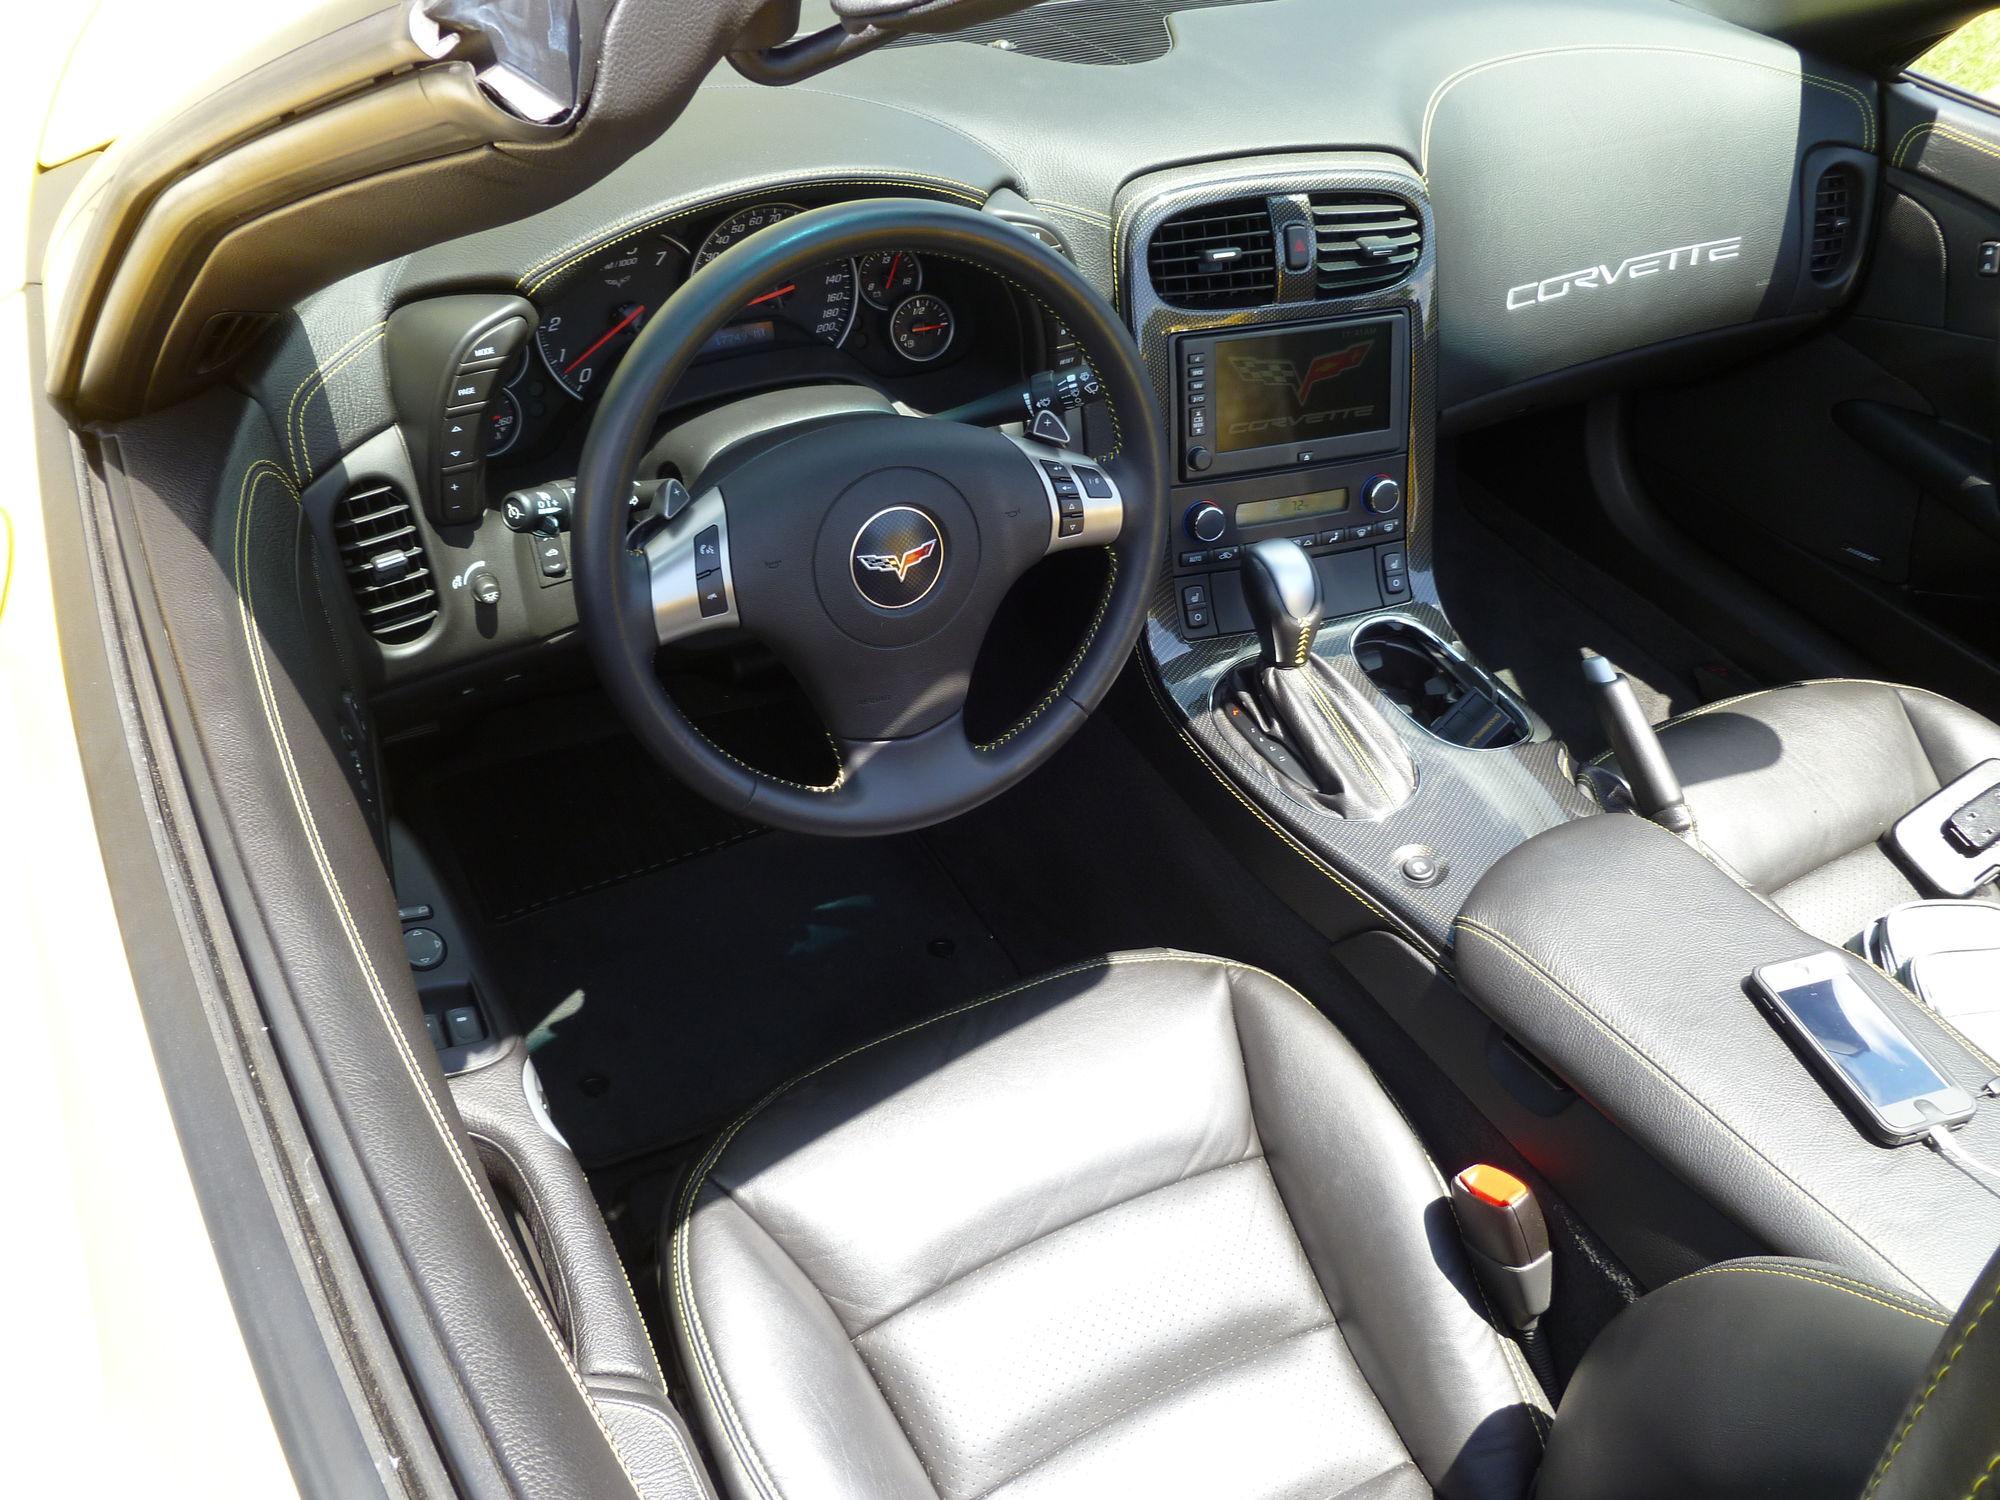 Fs For Sale 2011 Chevrolet Corvette Grand Sport Convertible 2 Door 4lt Palm Bay Fl